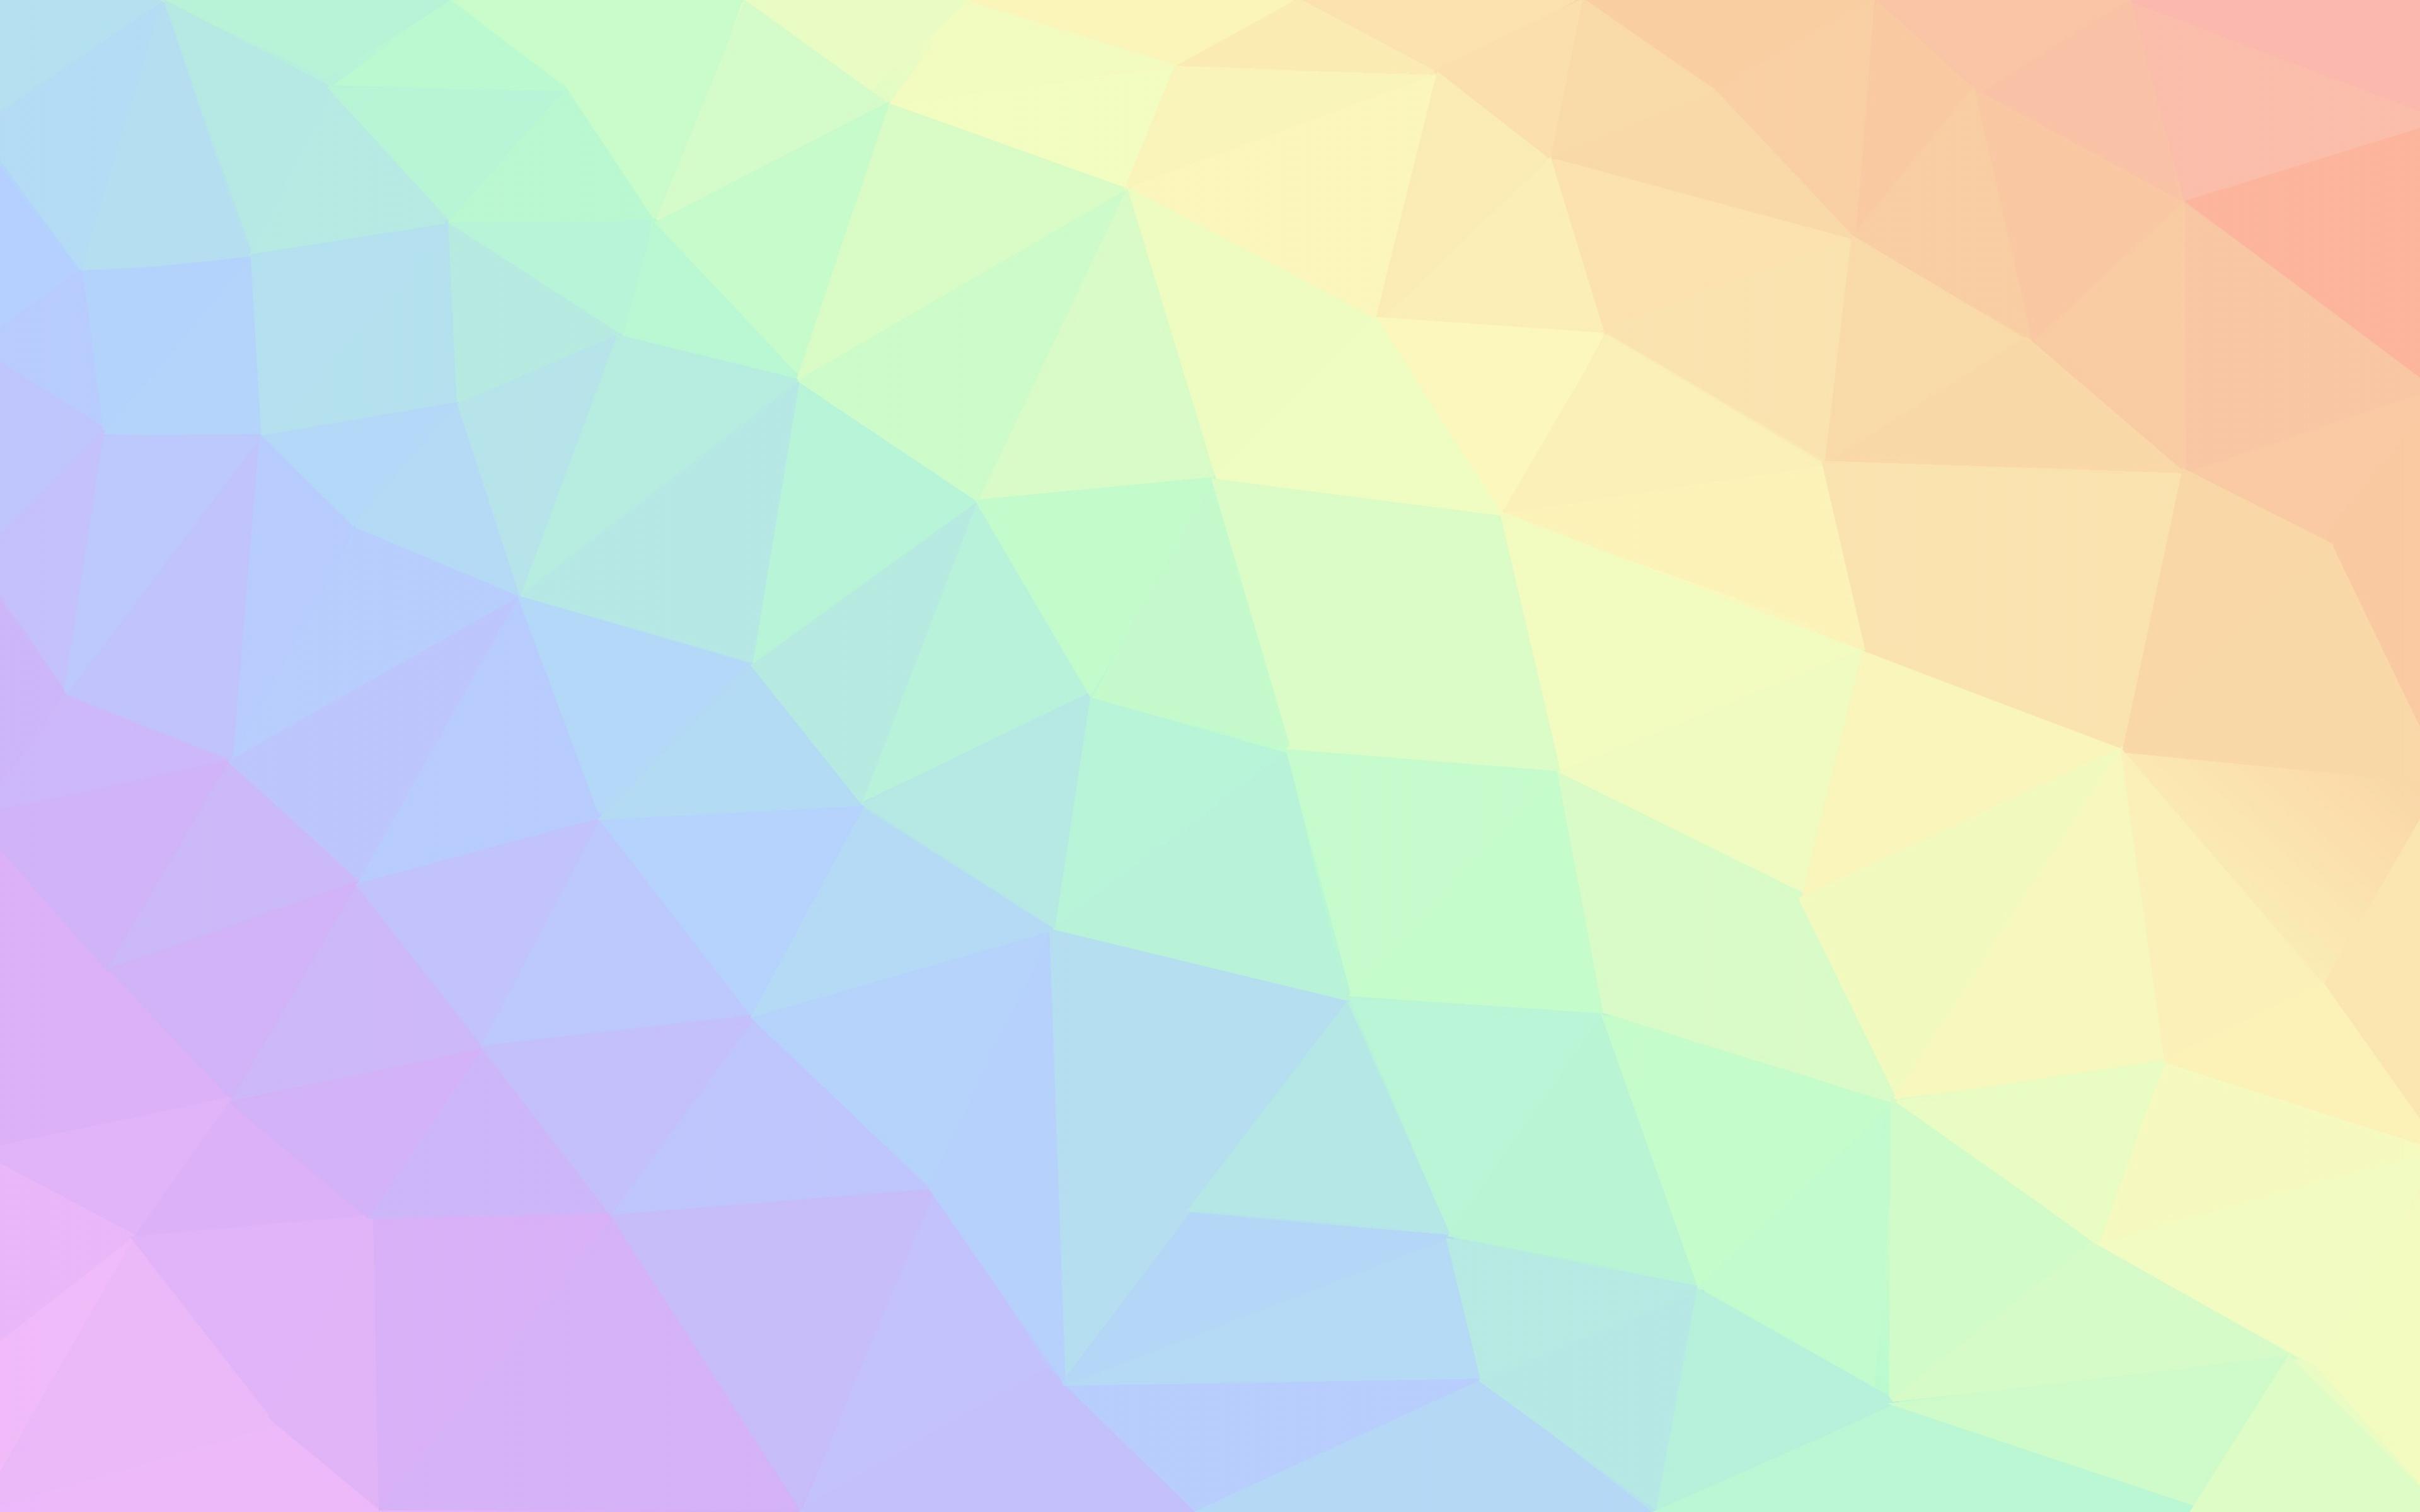 Sweet Cute Wallpapers Of Flowers Download 3840x2400 Wallpaper Light Colors Geometric